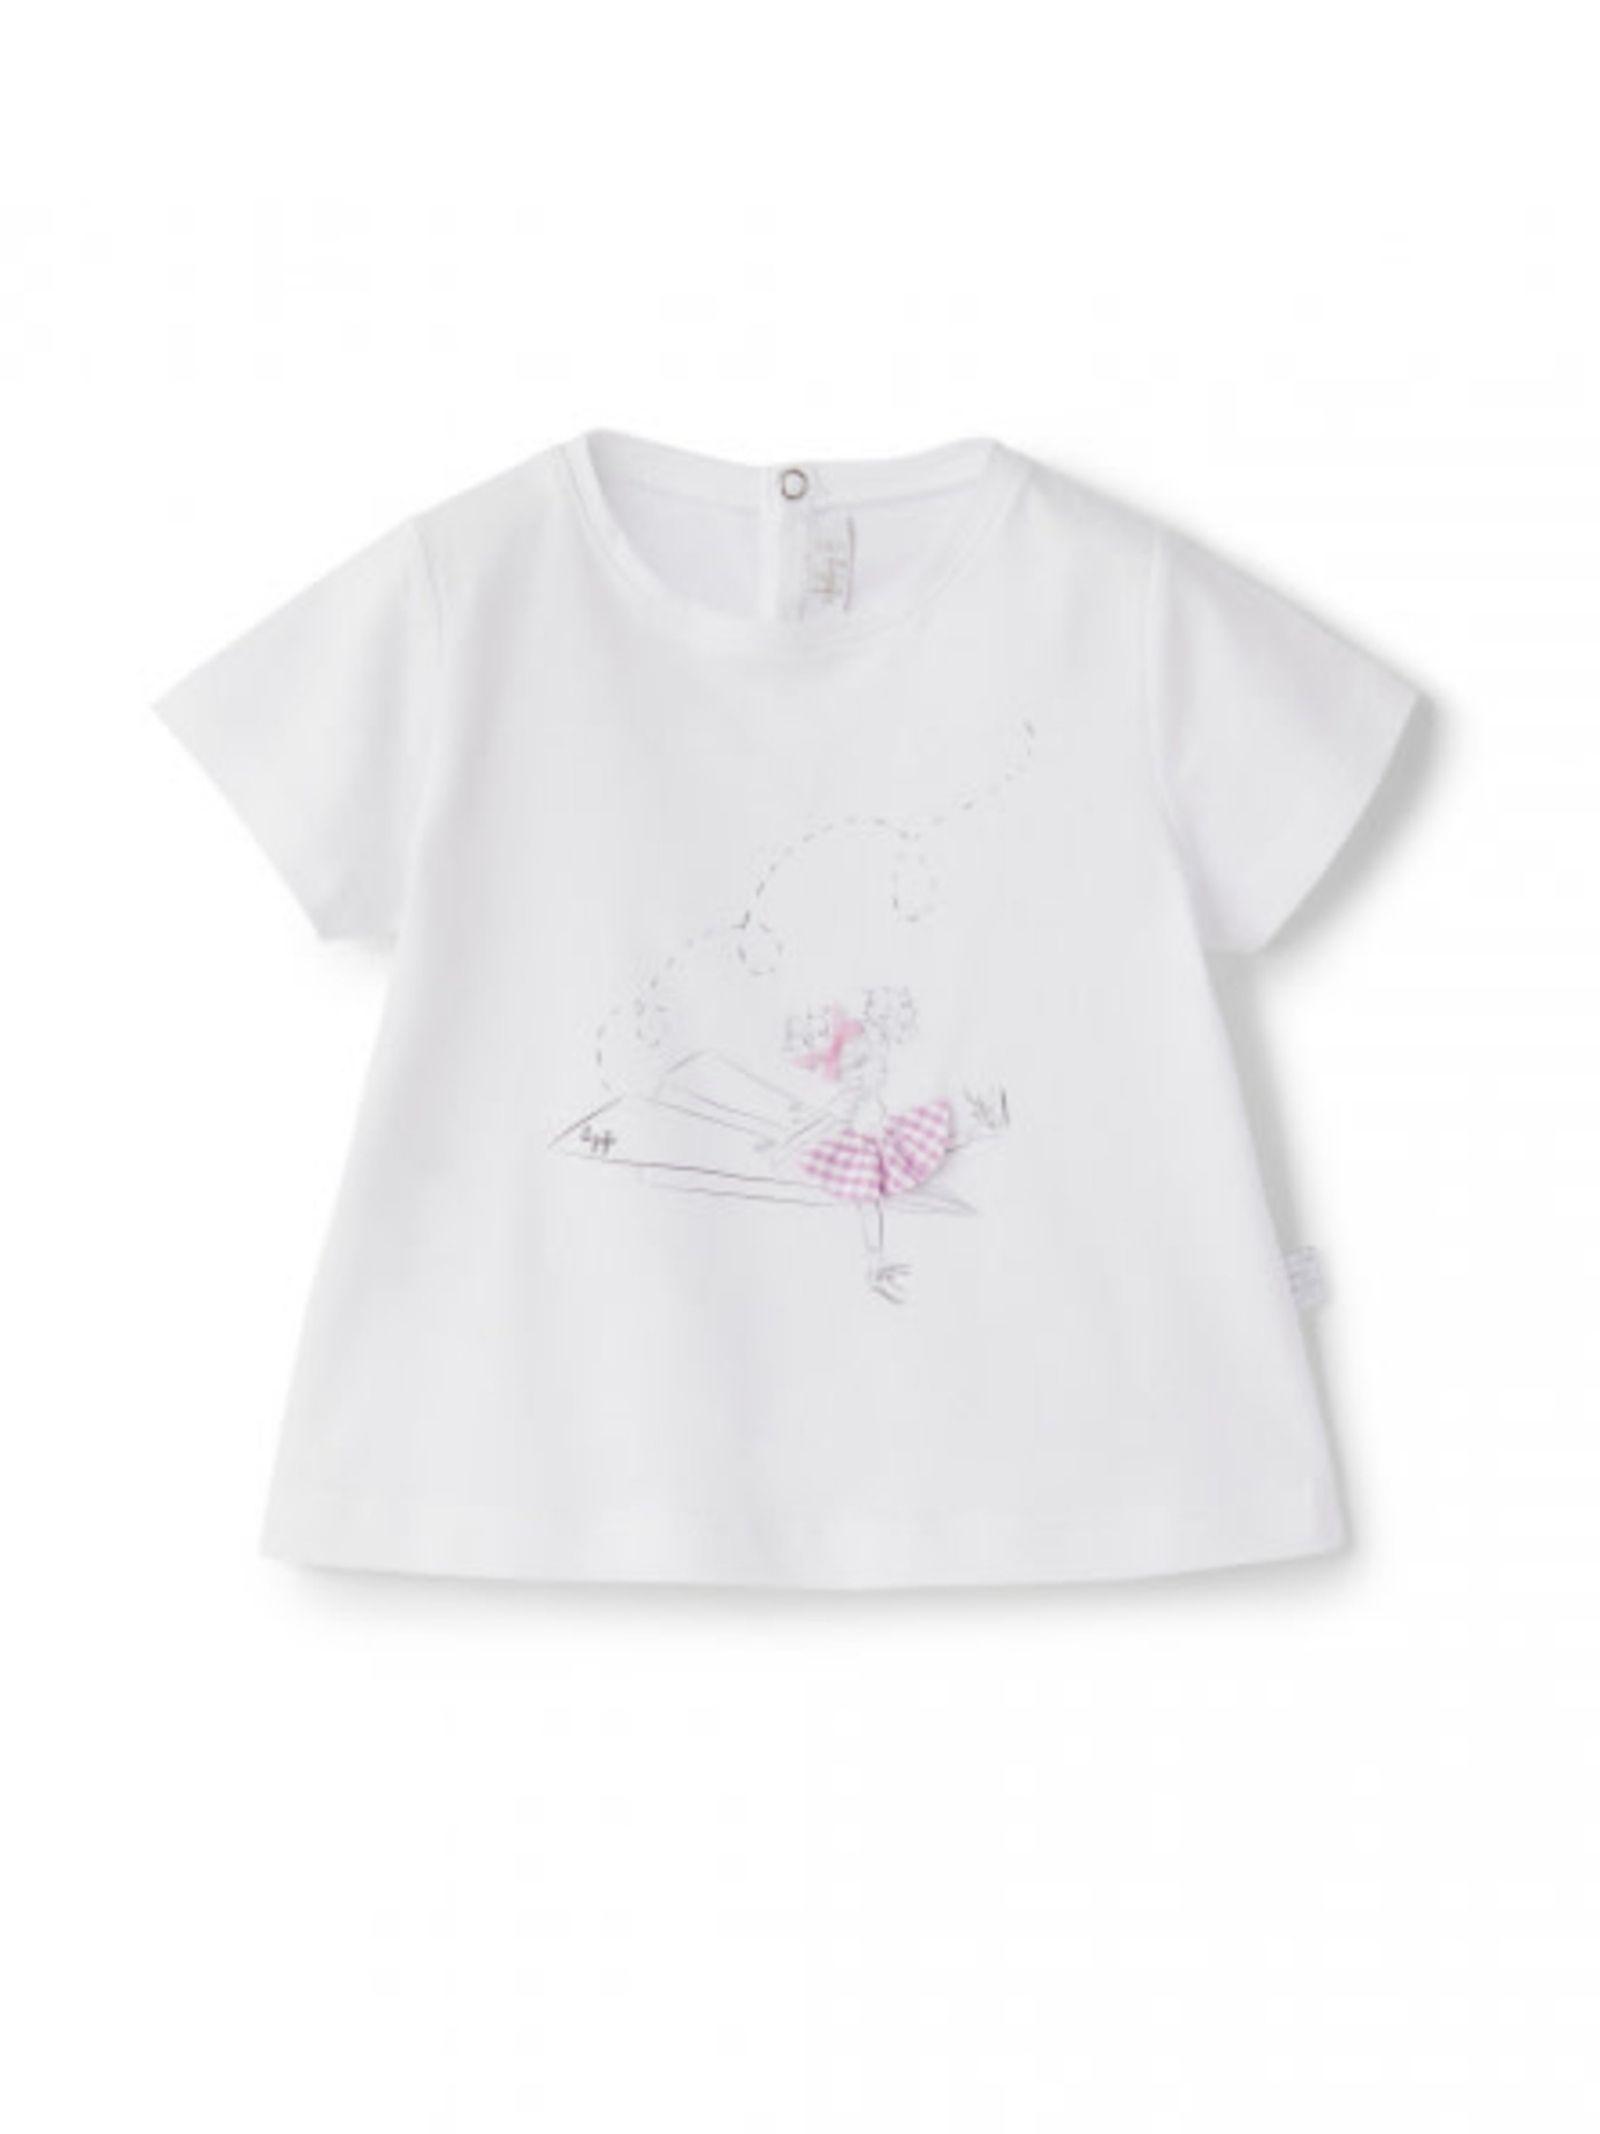 IL GUFO | T-shirt | CP21TS306M00140162